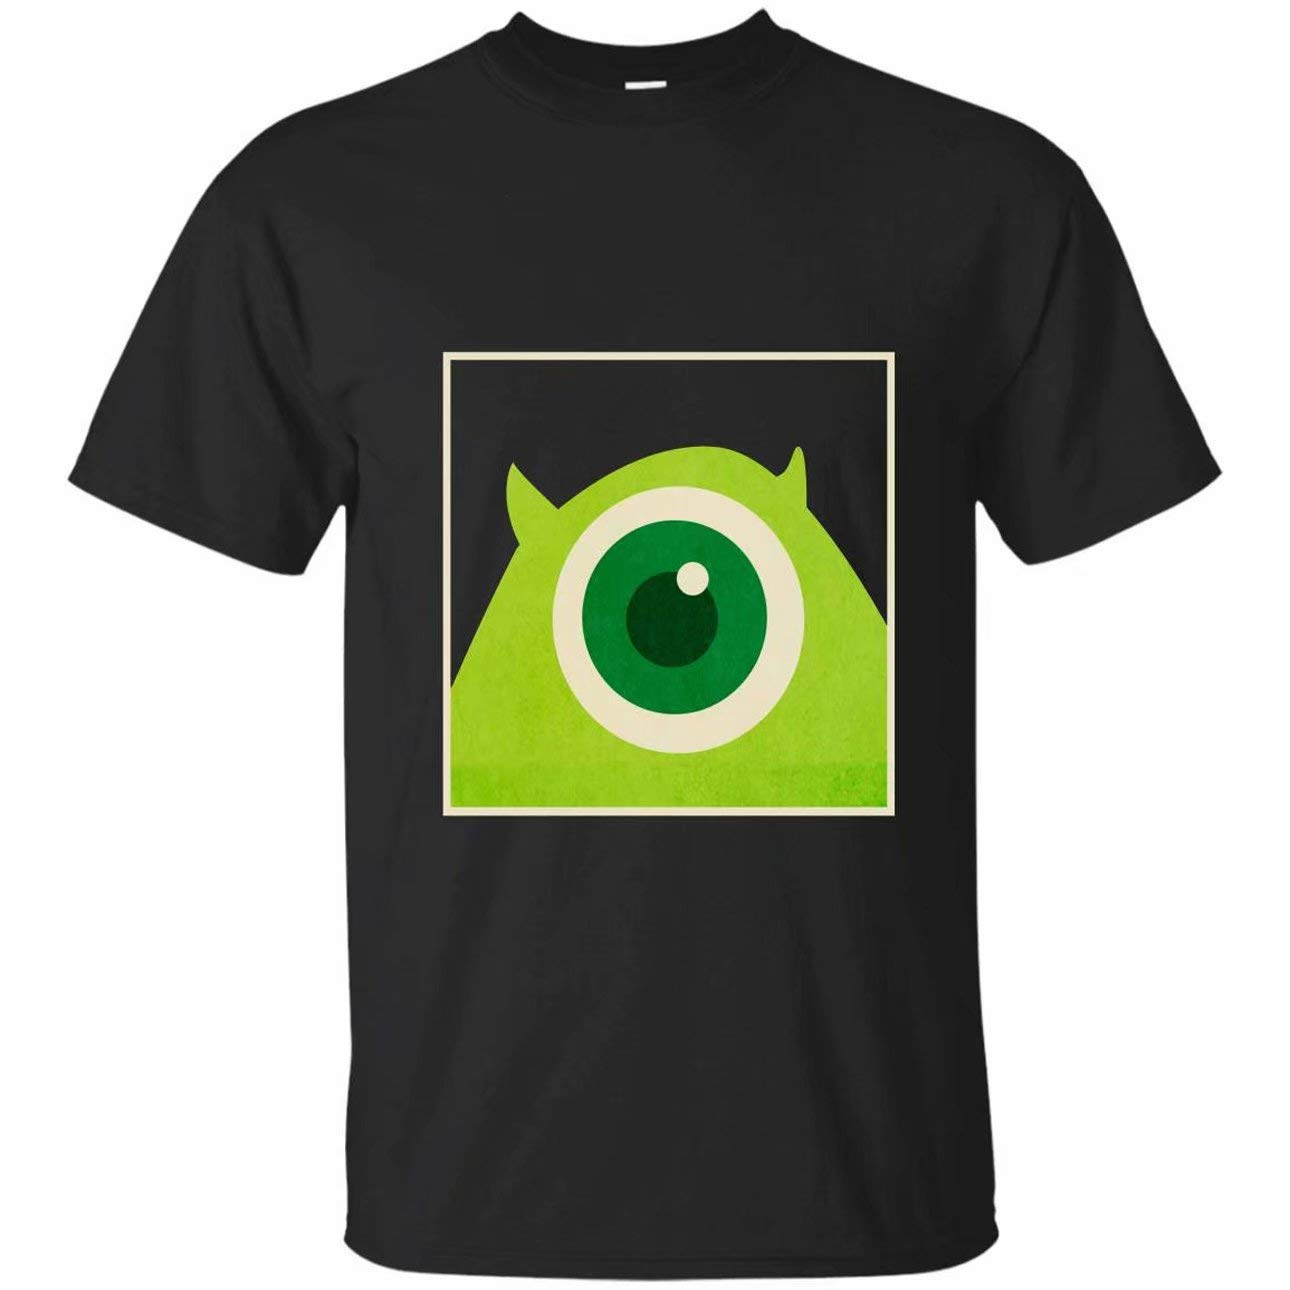 Depeal Mike Wazowski Eye Shirt Mike Wazowski Halloween Shirt